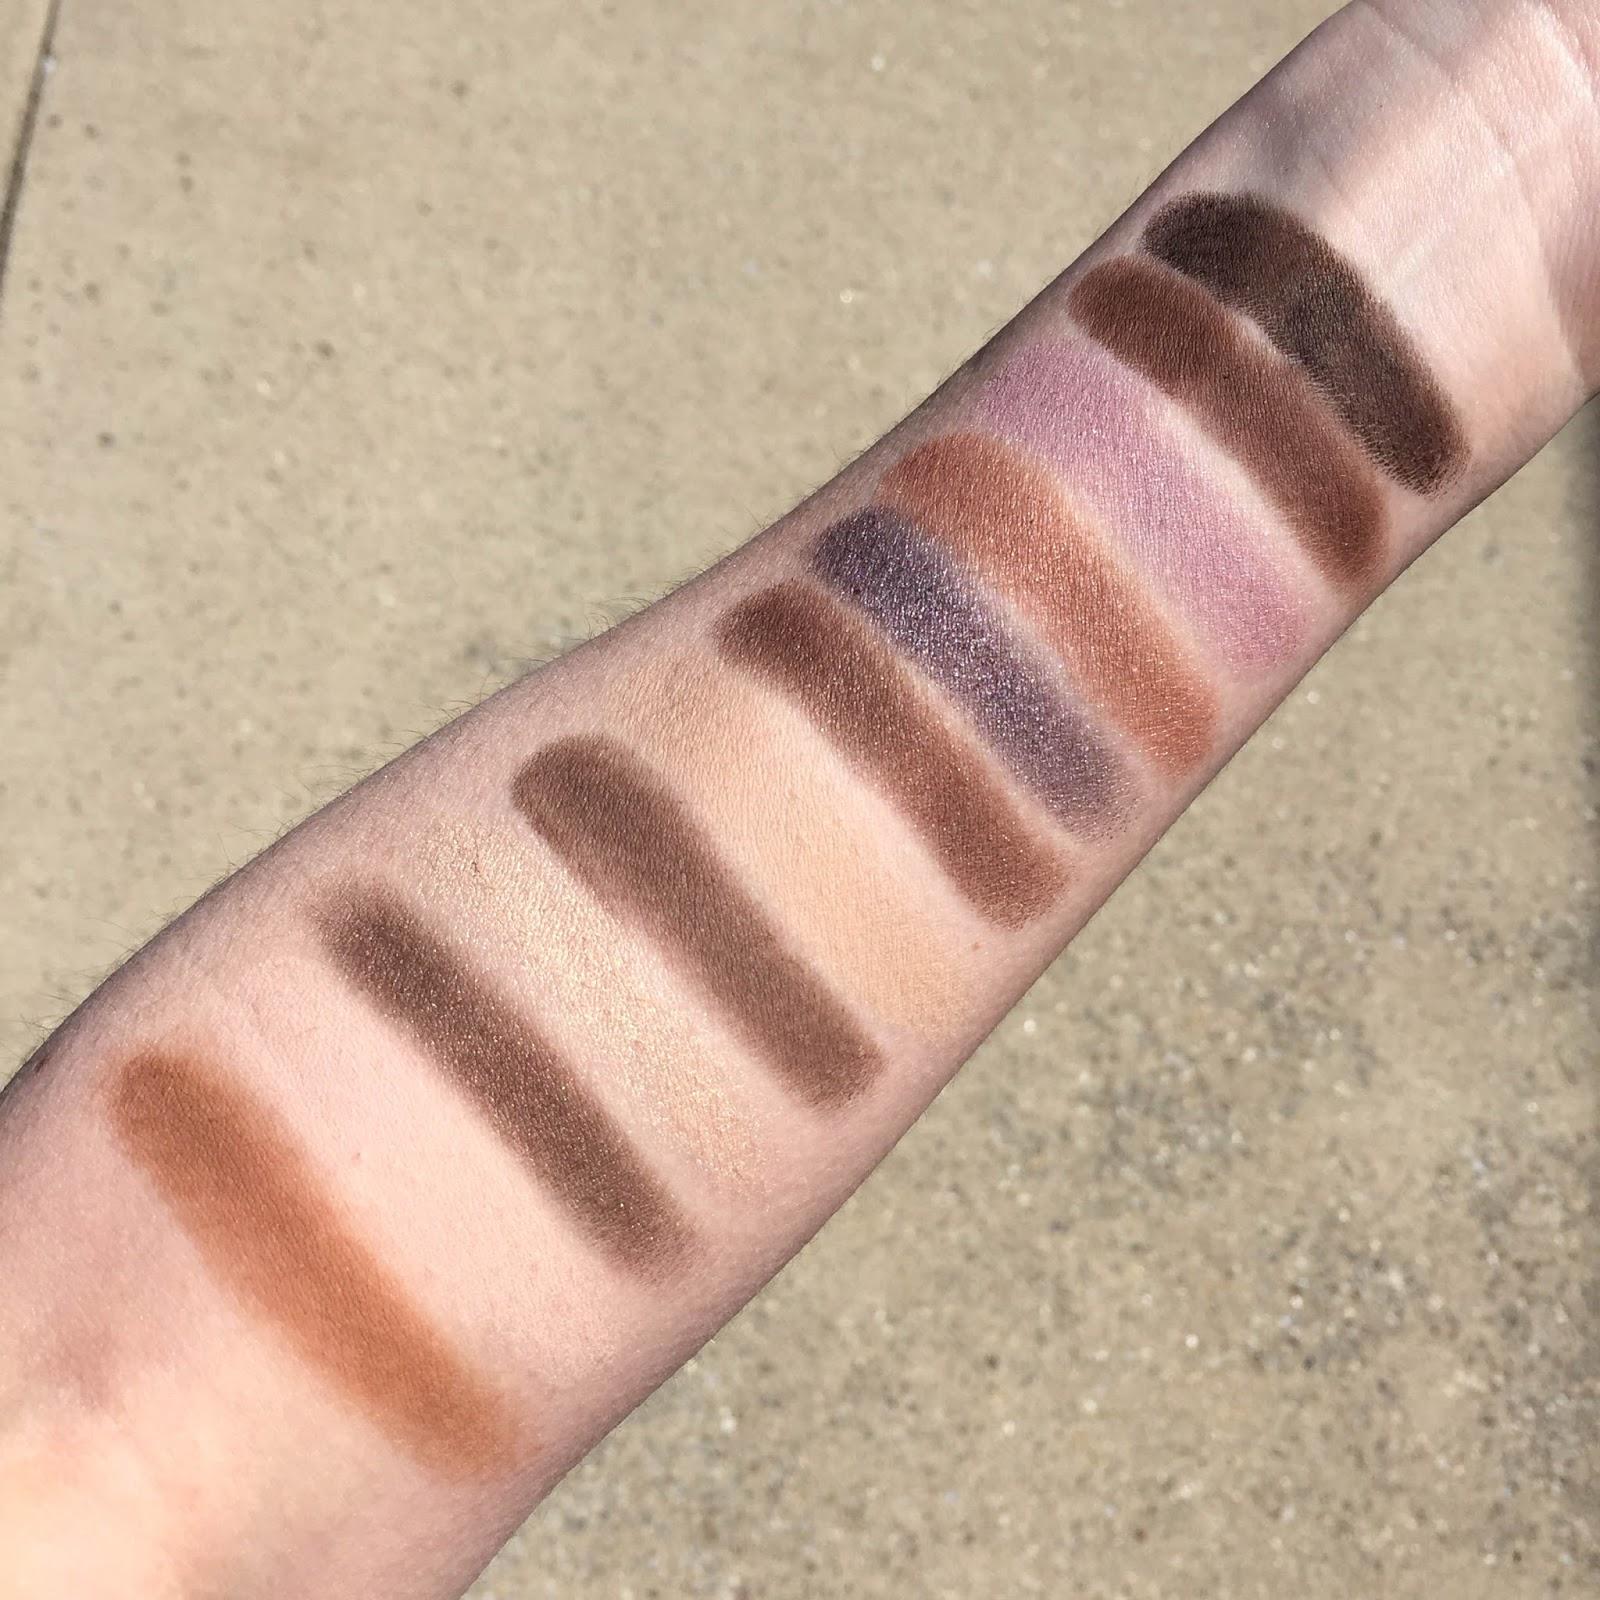 Laura Mercier Extreme Neutrals palette with swatches on fair skin